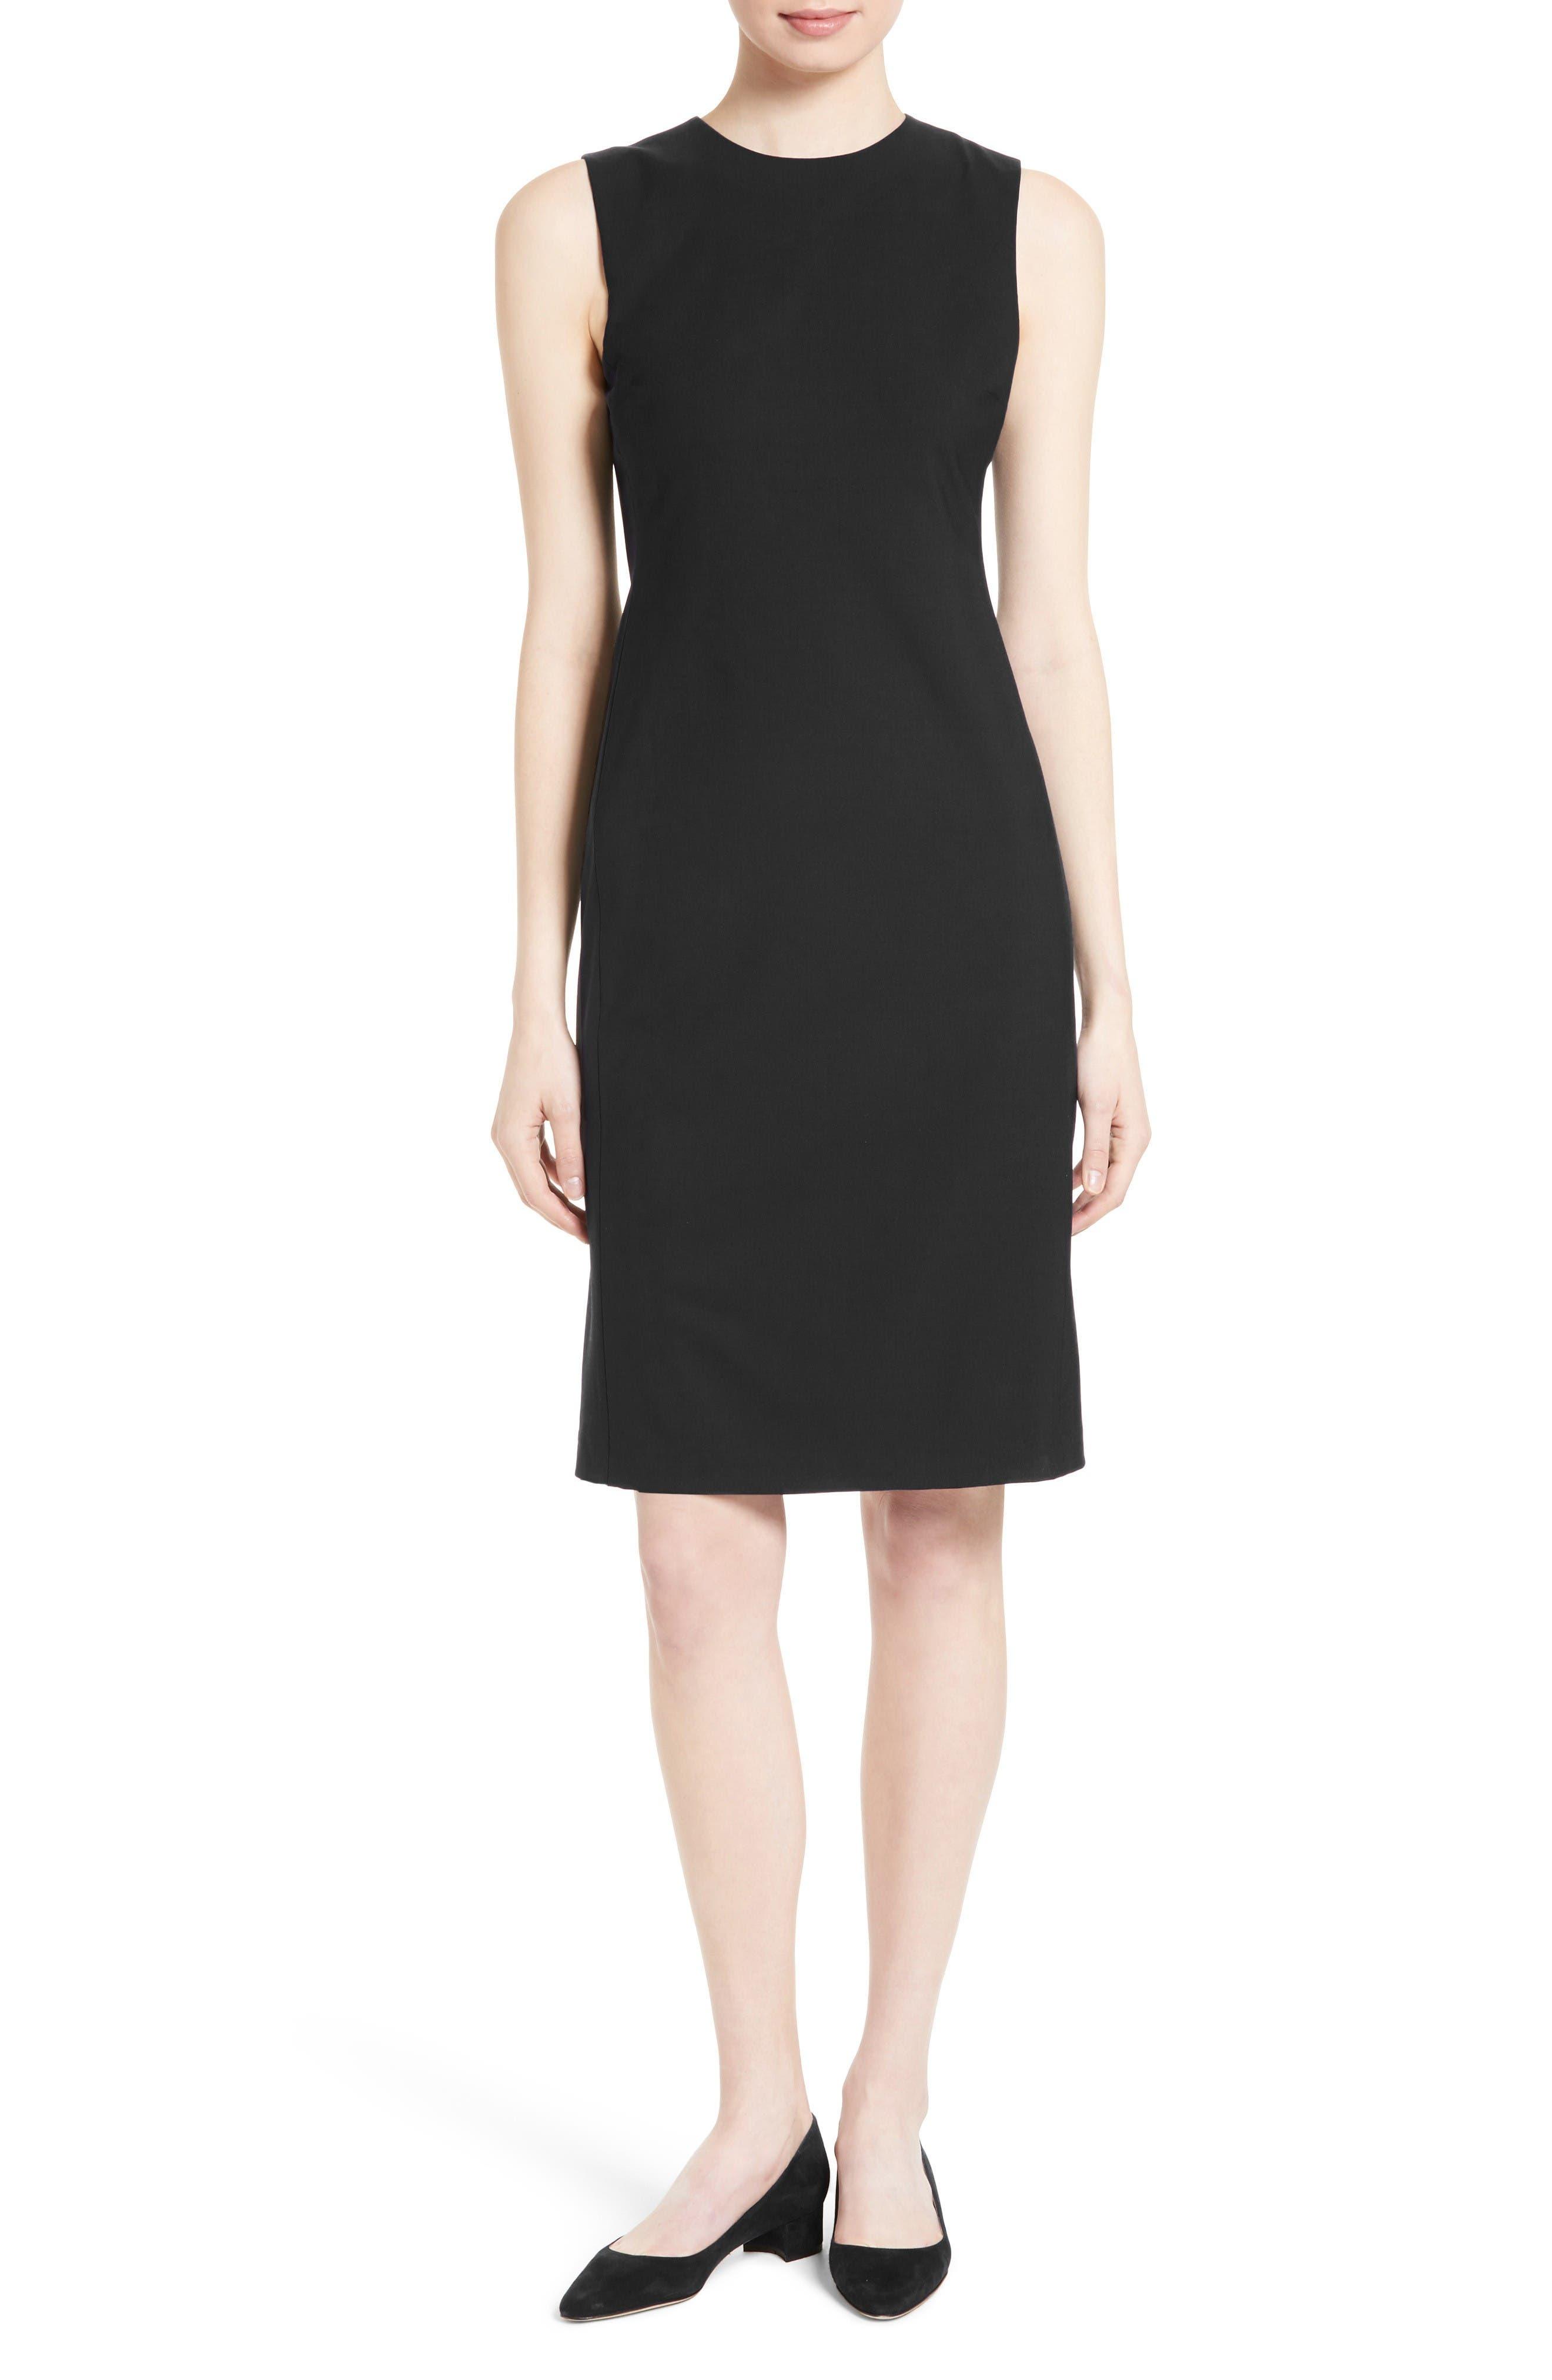 Theory Black Wool Short Sleeve Dress